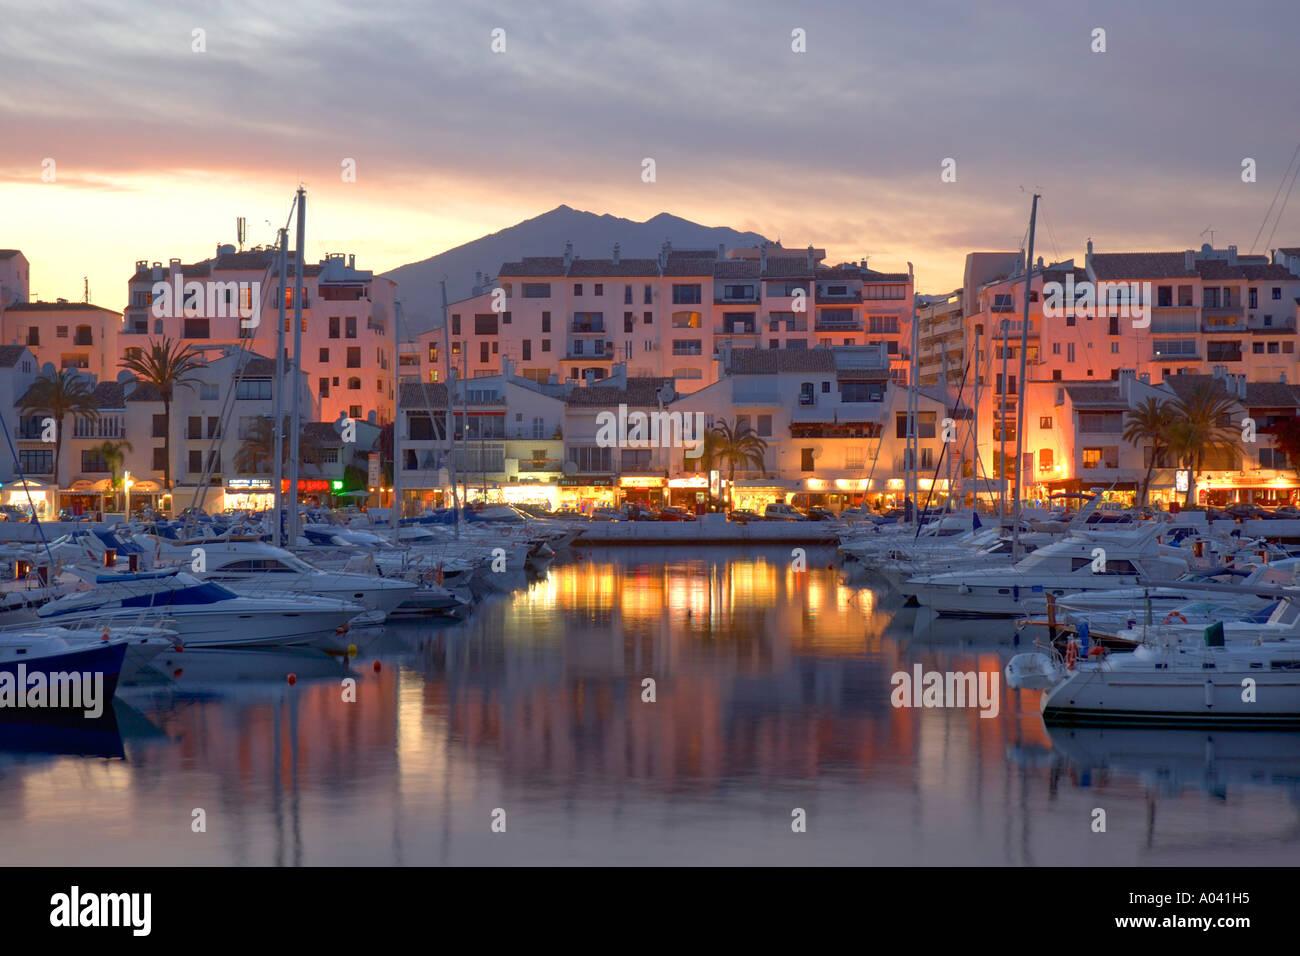 Puerto Banus Marina Marbella Malaga Province Andalucia Spain Stock Photo Royalty Free Image